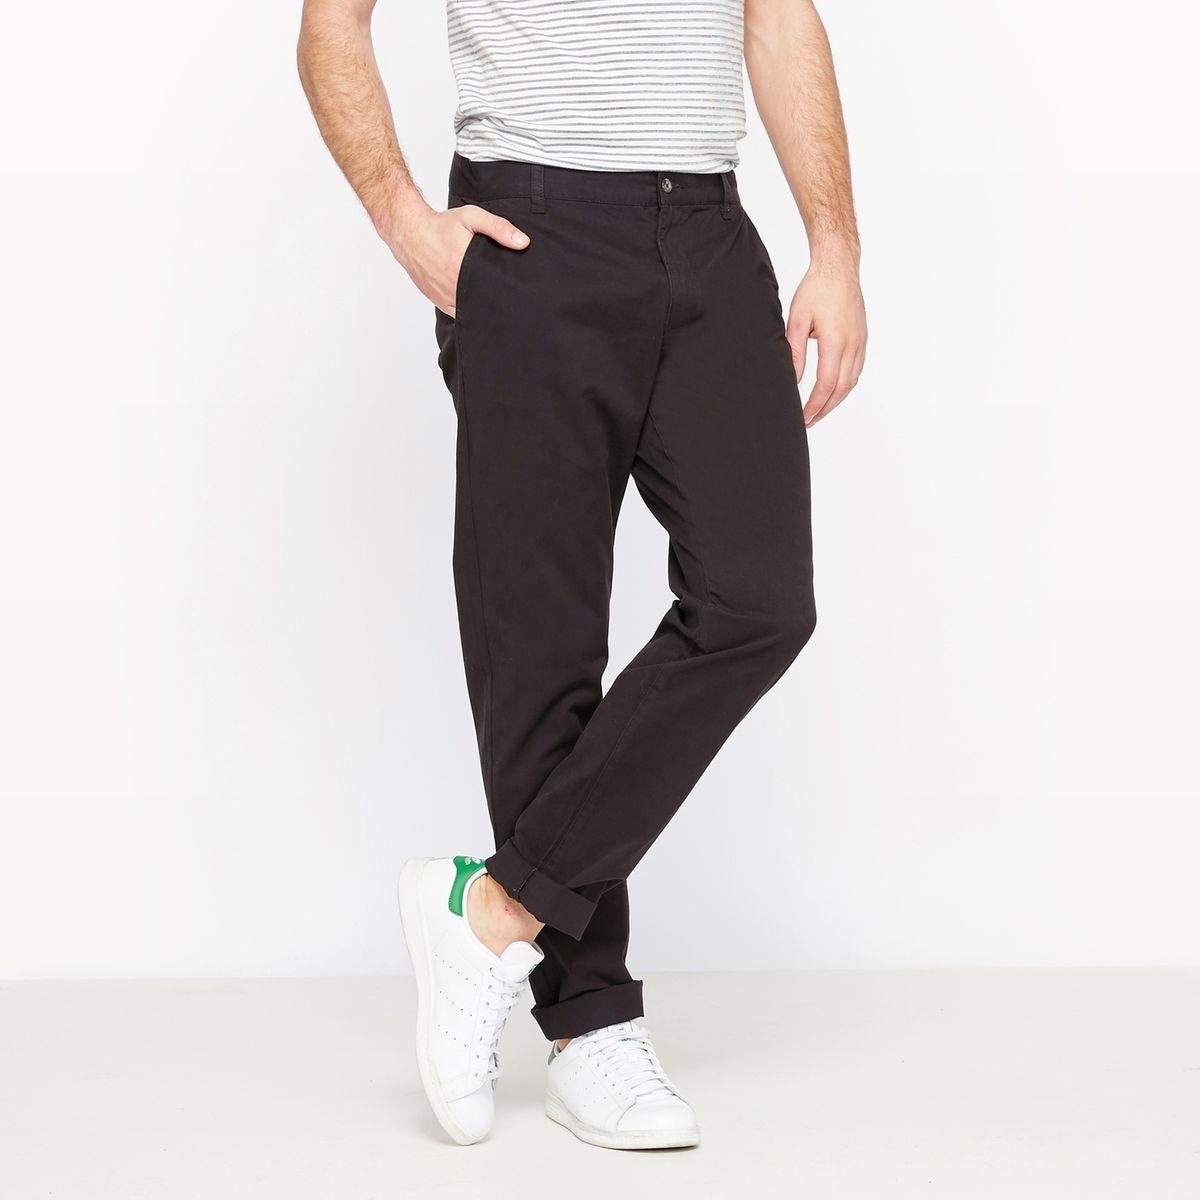 Pantalon chino ADRIEN coupe droite